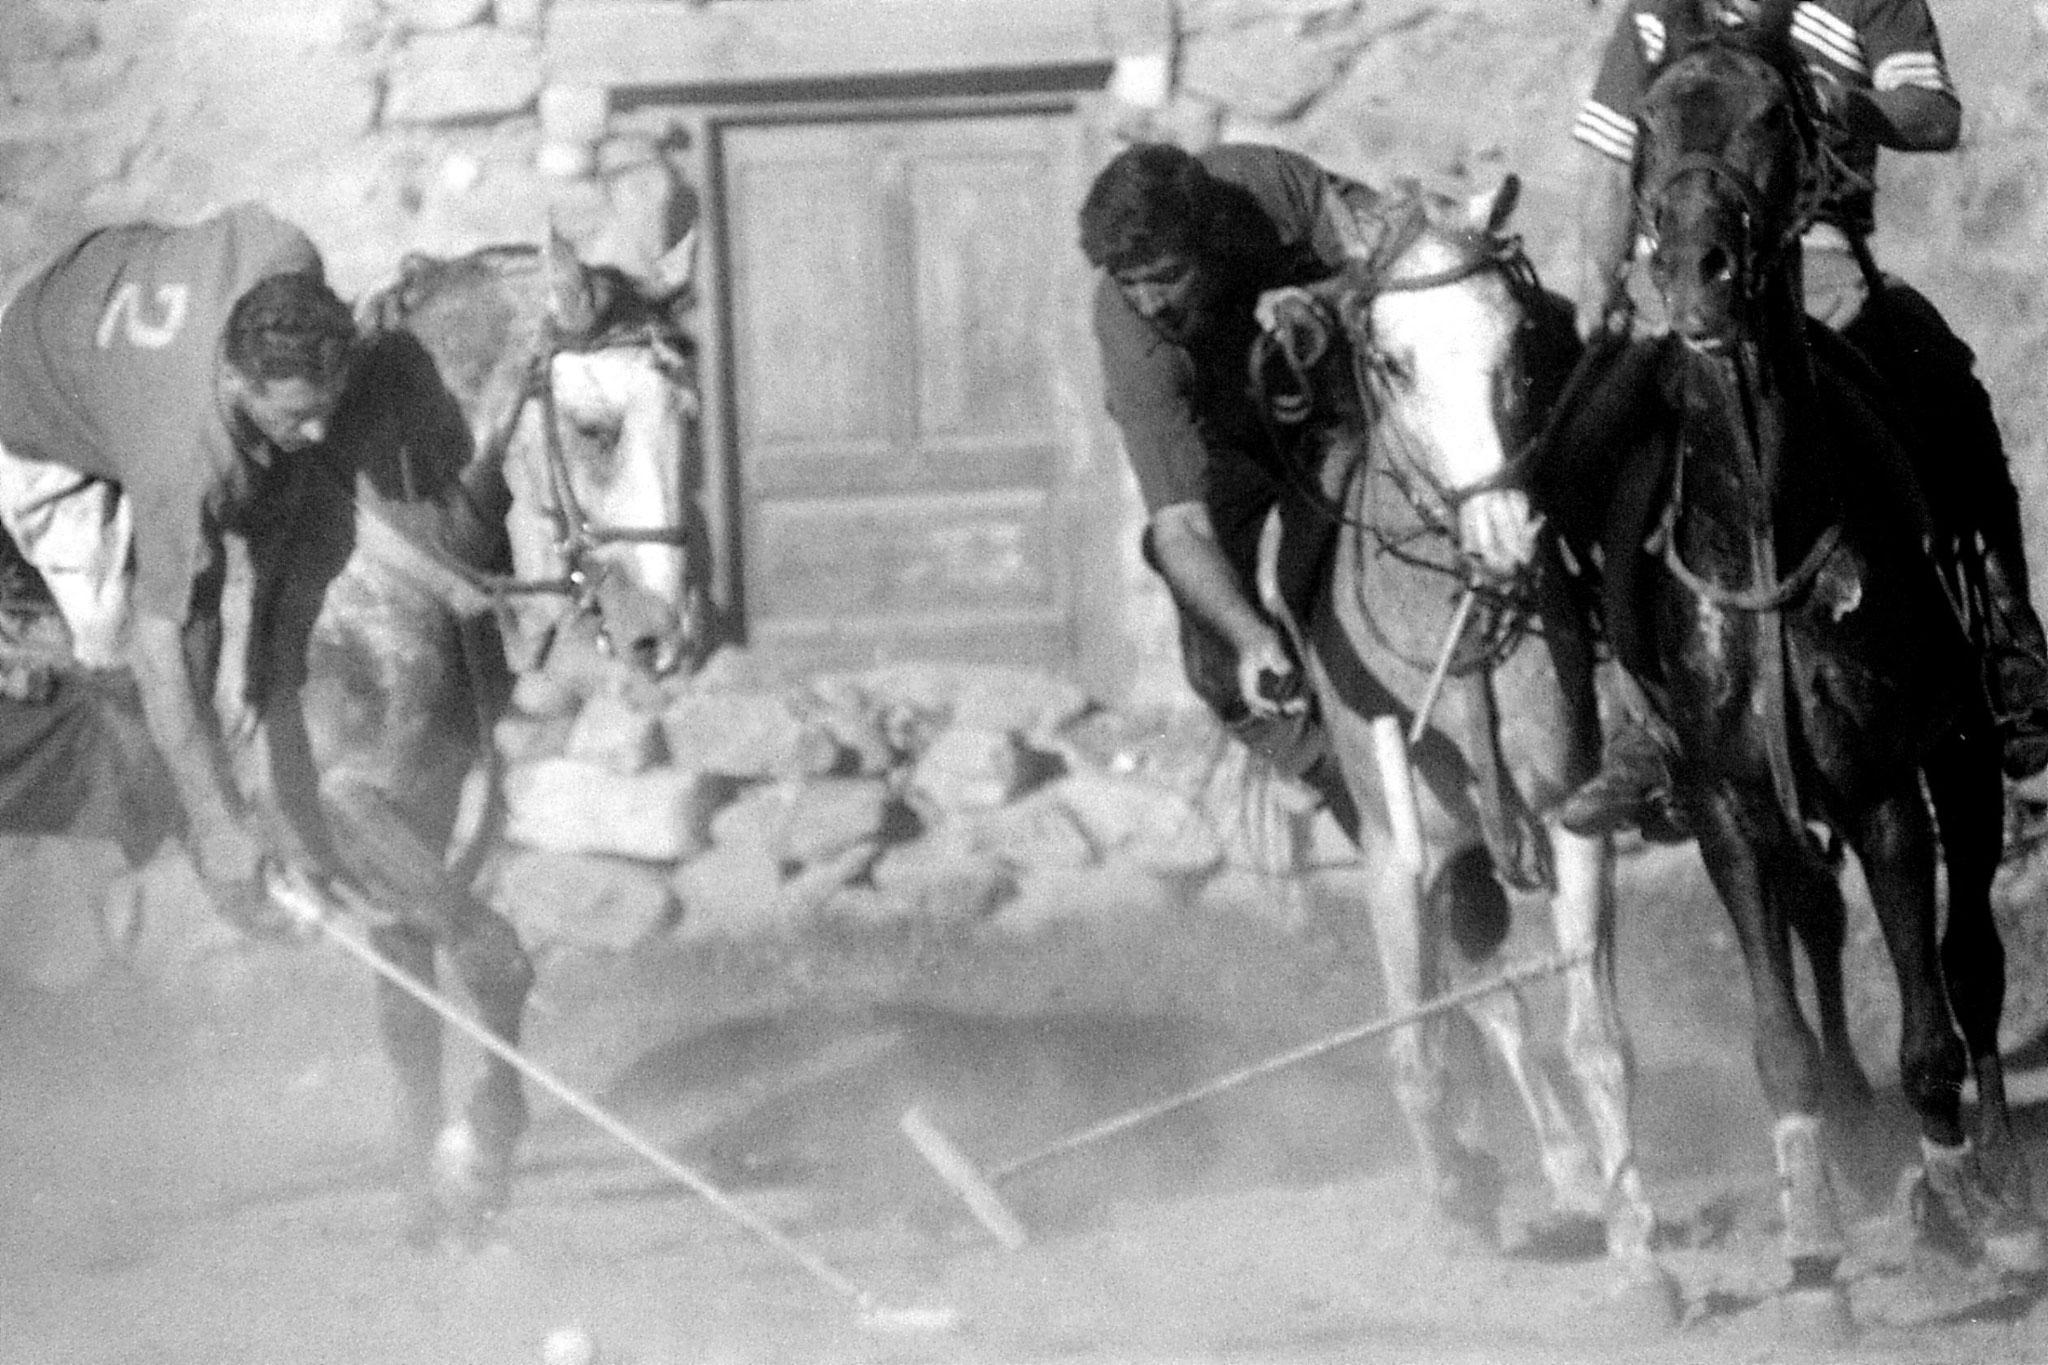 9/10/1989: 4: Gilgit polo match